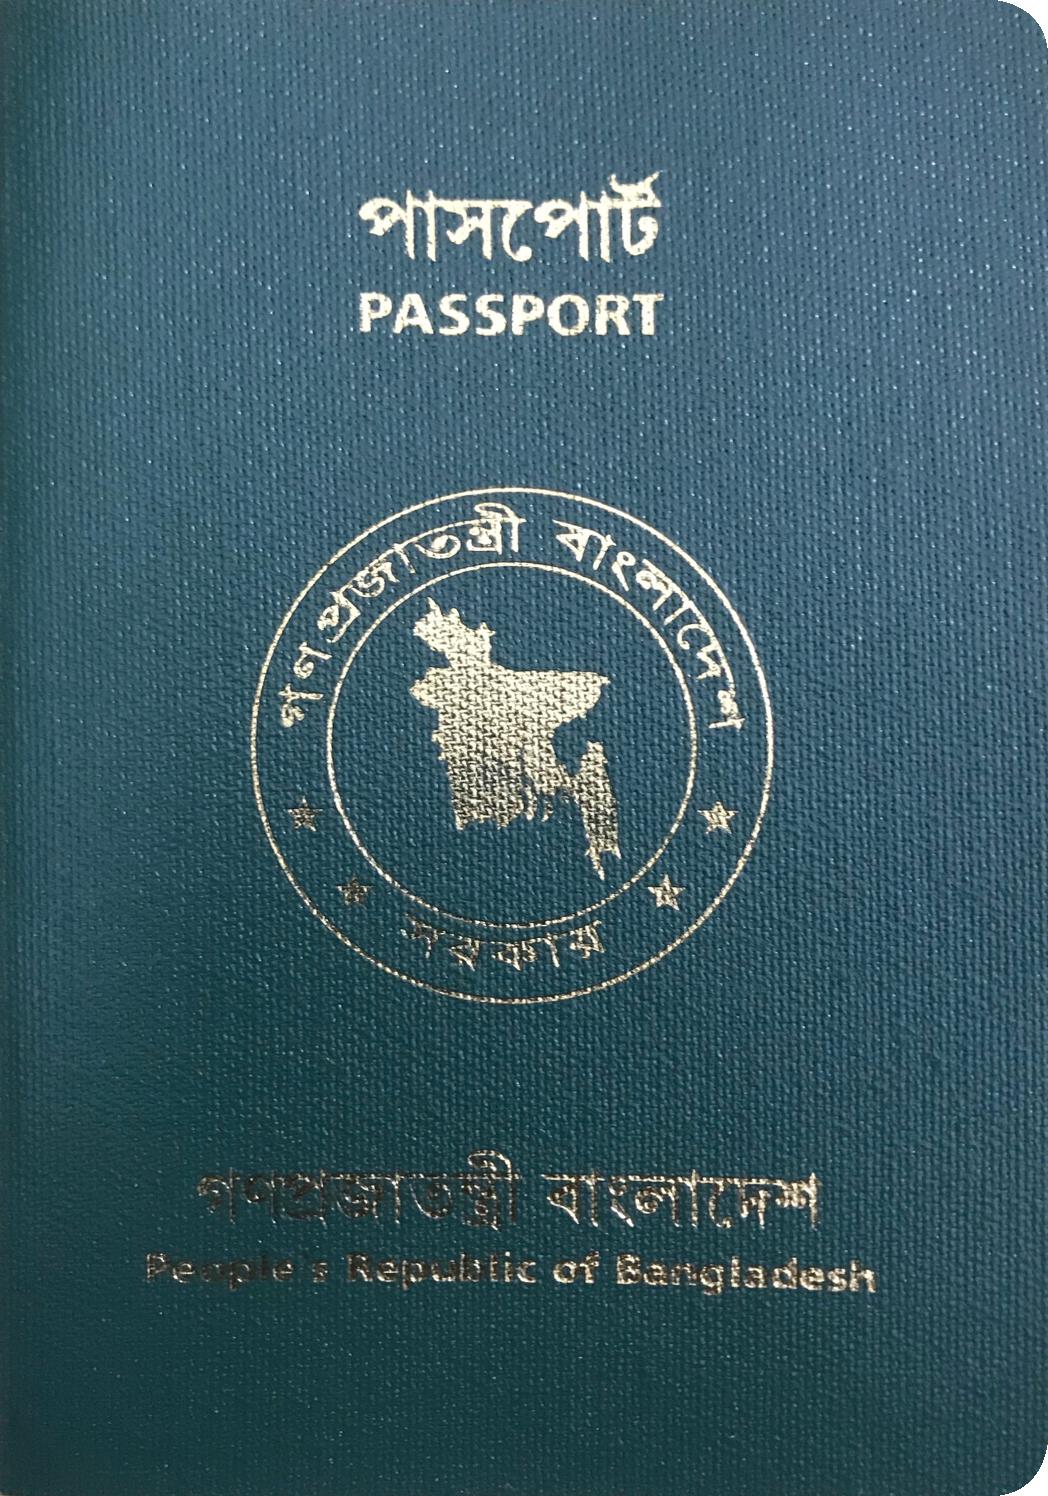 A regular or ordinary Bangladeshi passport - Front side